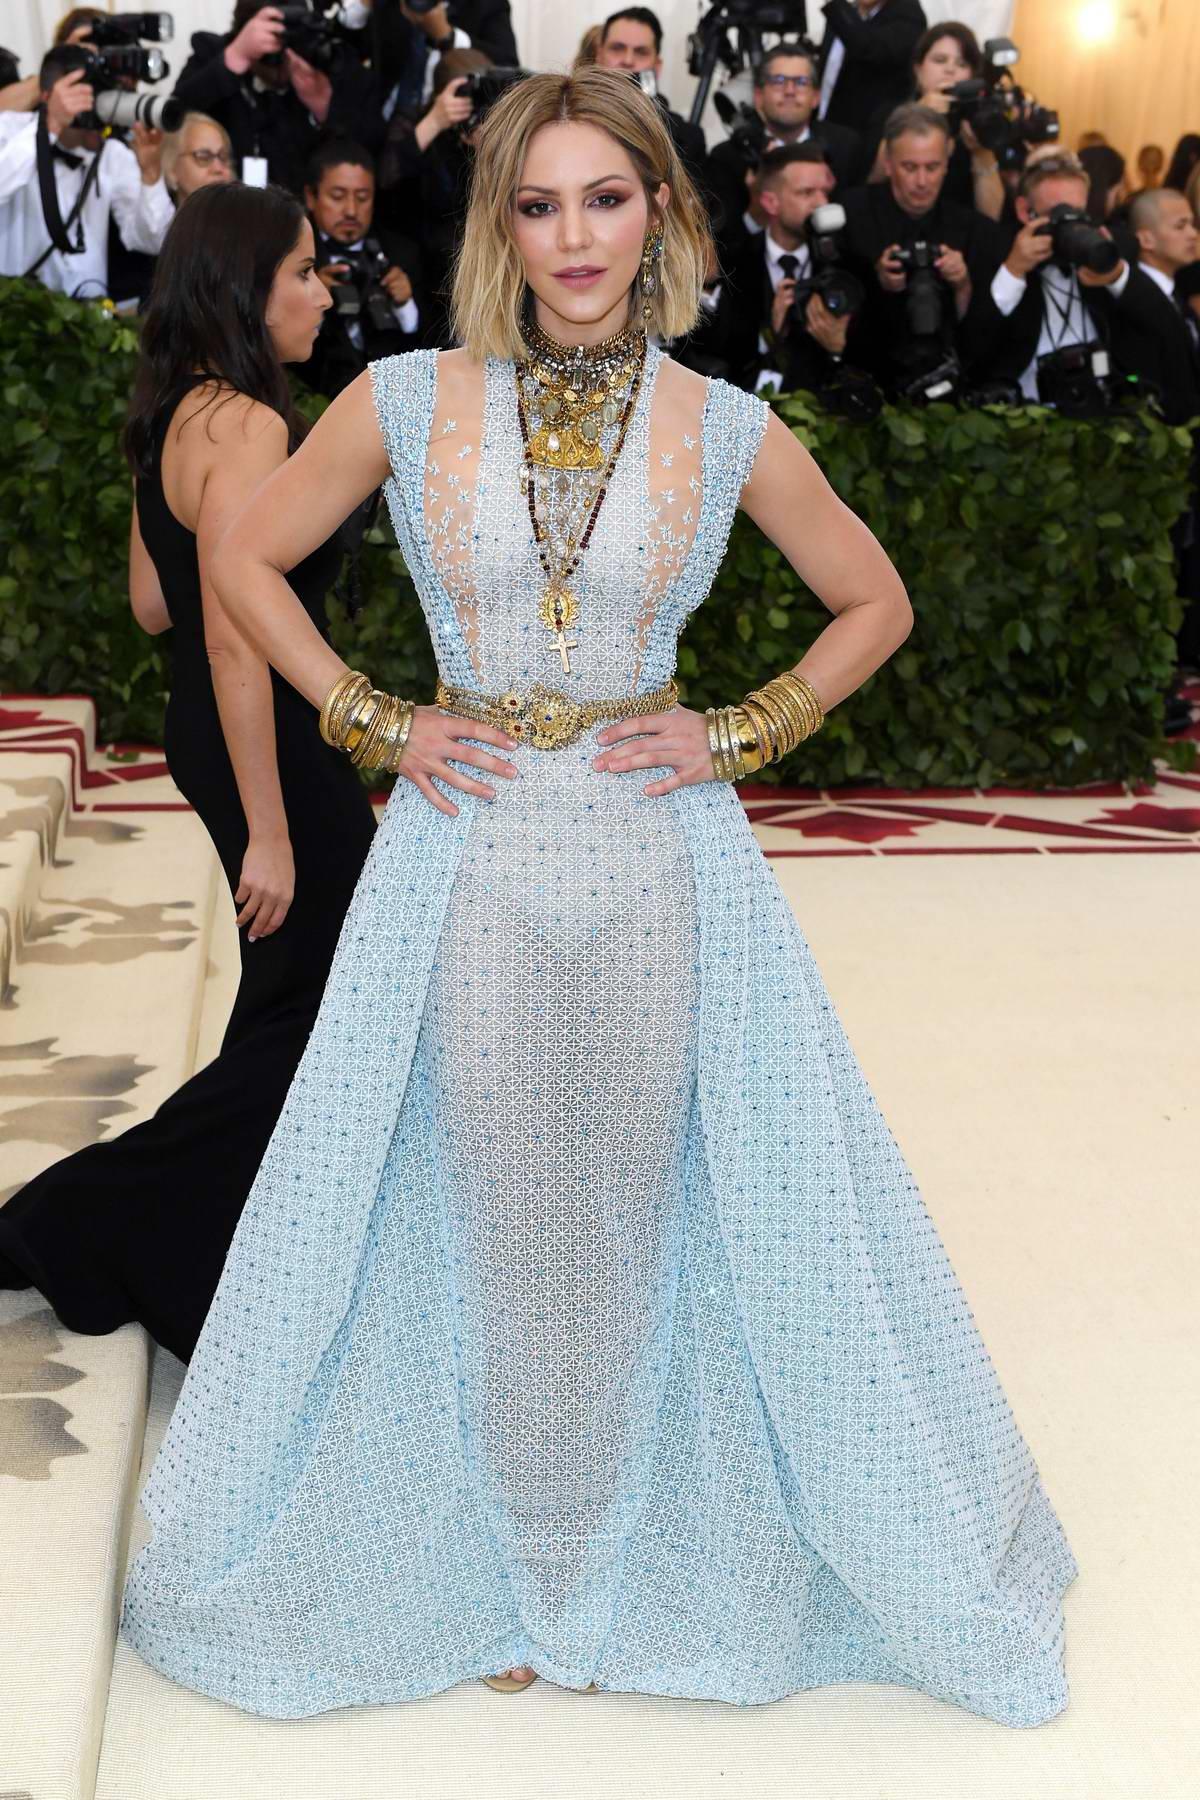 Katharine McPhee attends The Costume Institute Benefit Gala (MET Gala 2018) at Metropolitan Museum of Art in New York City